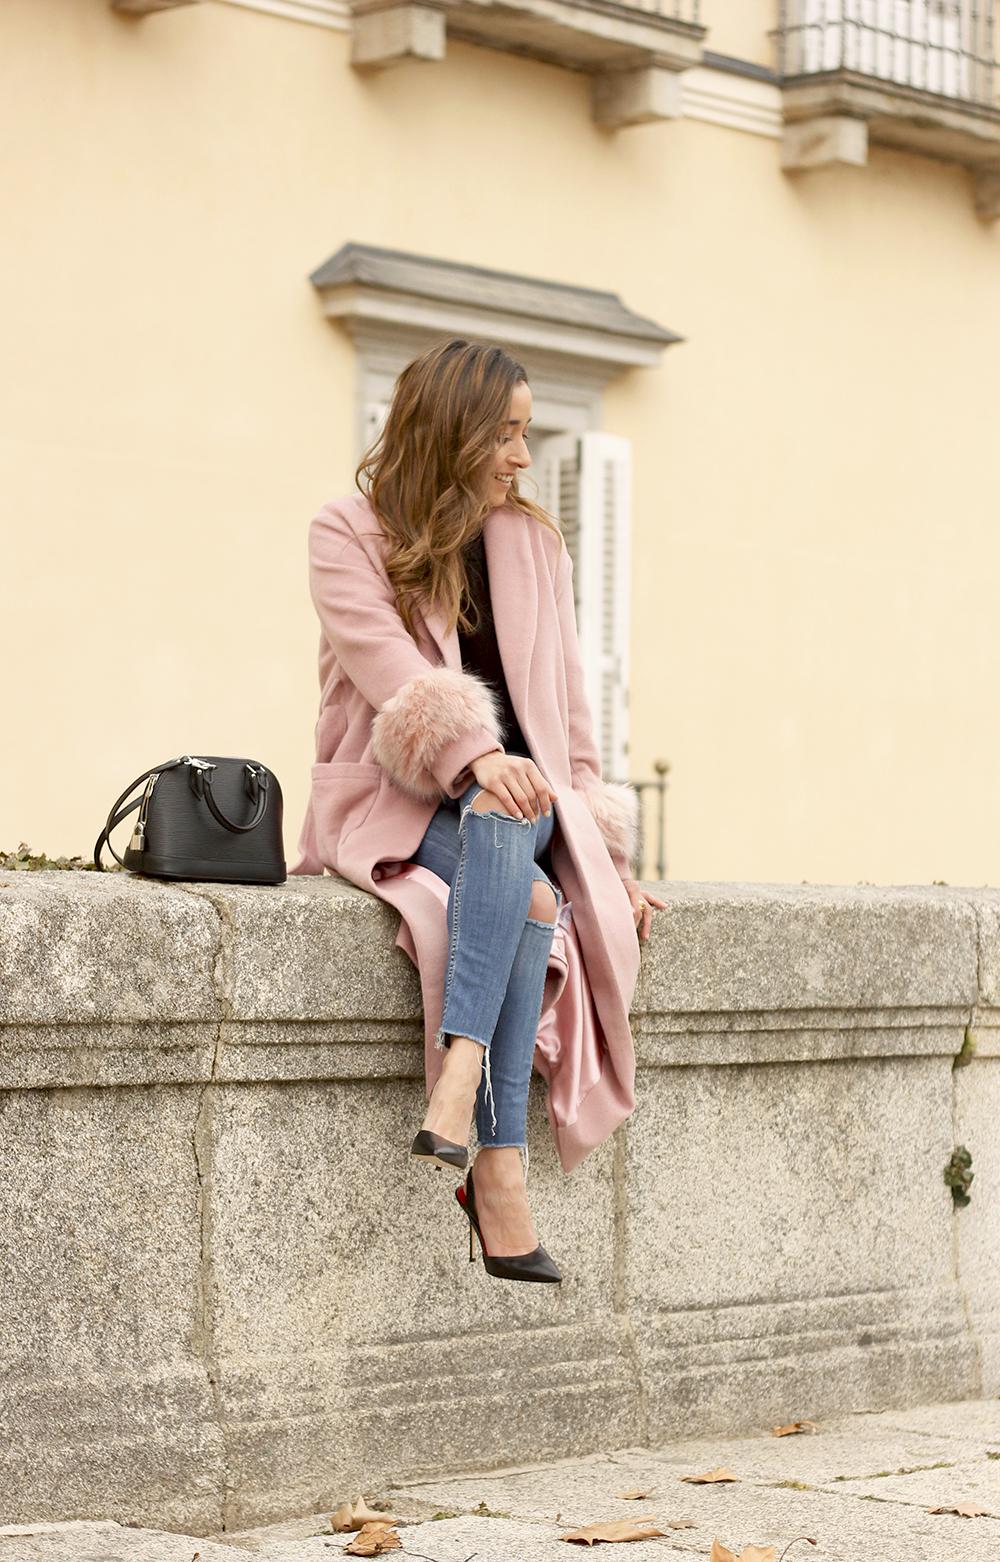 pink coat byleclair carolina herrera heels jeans louis vuitton ba street style outfit 20193